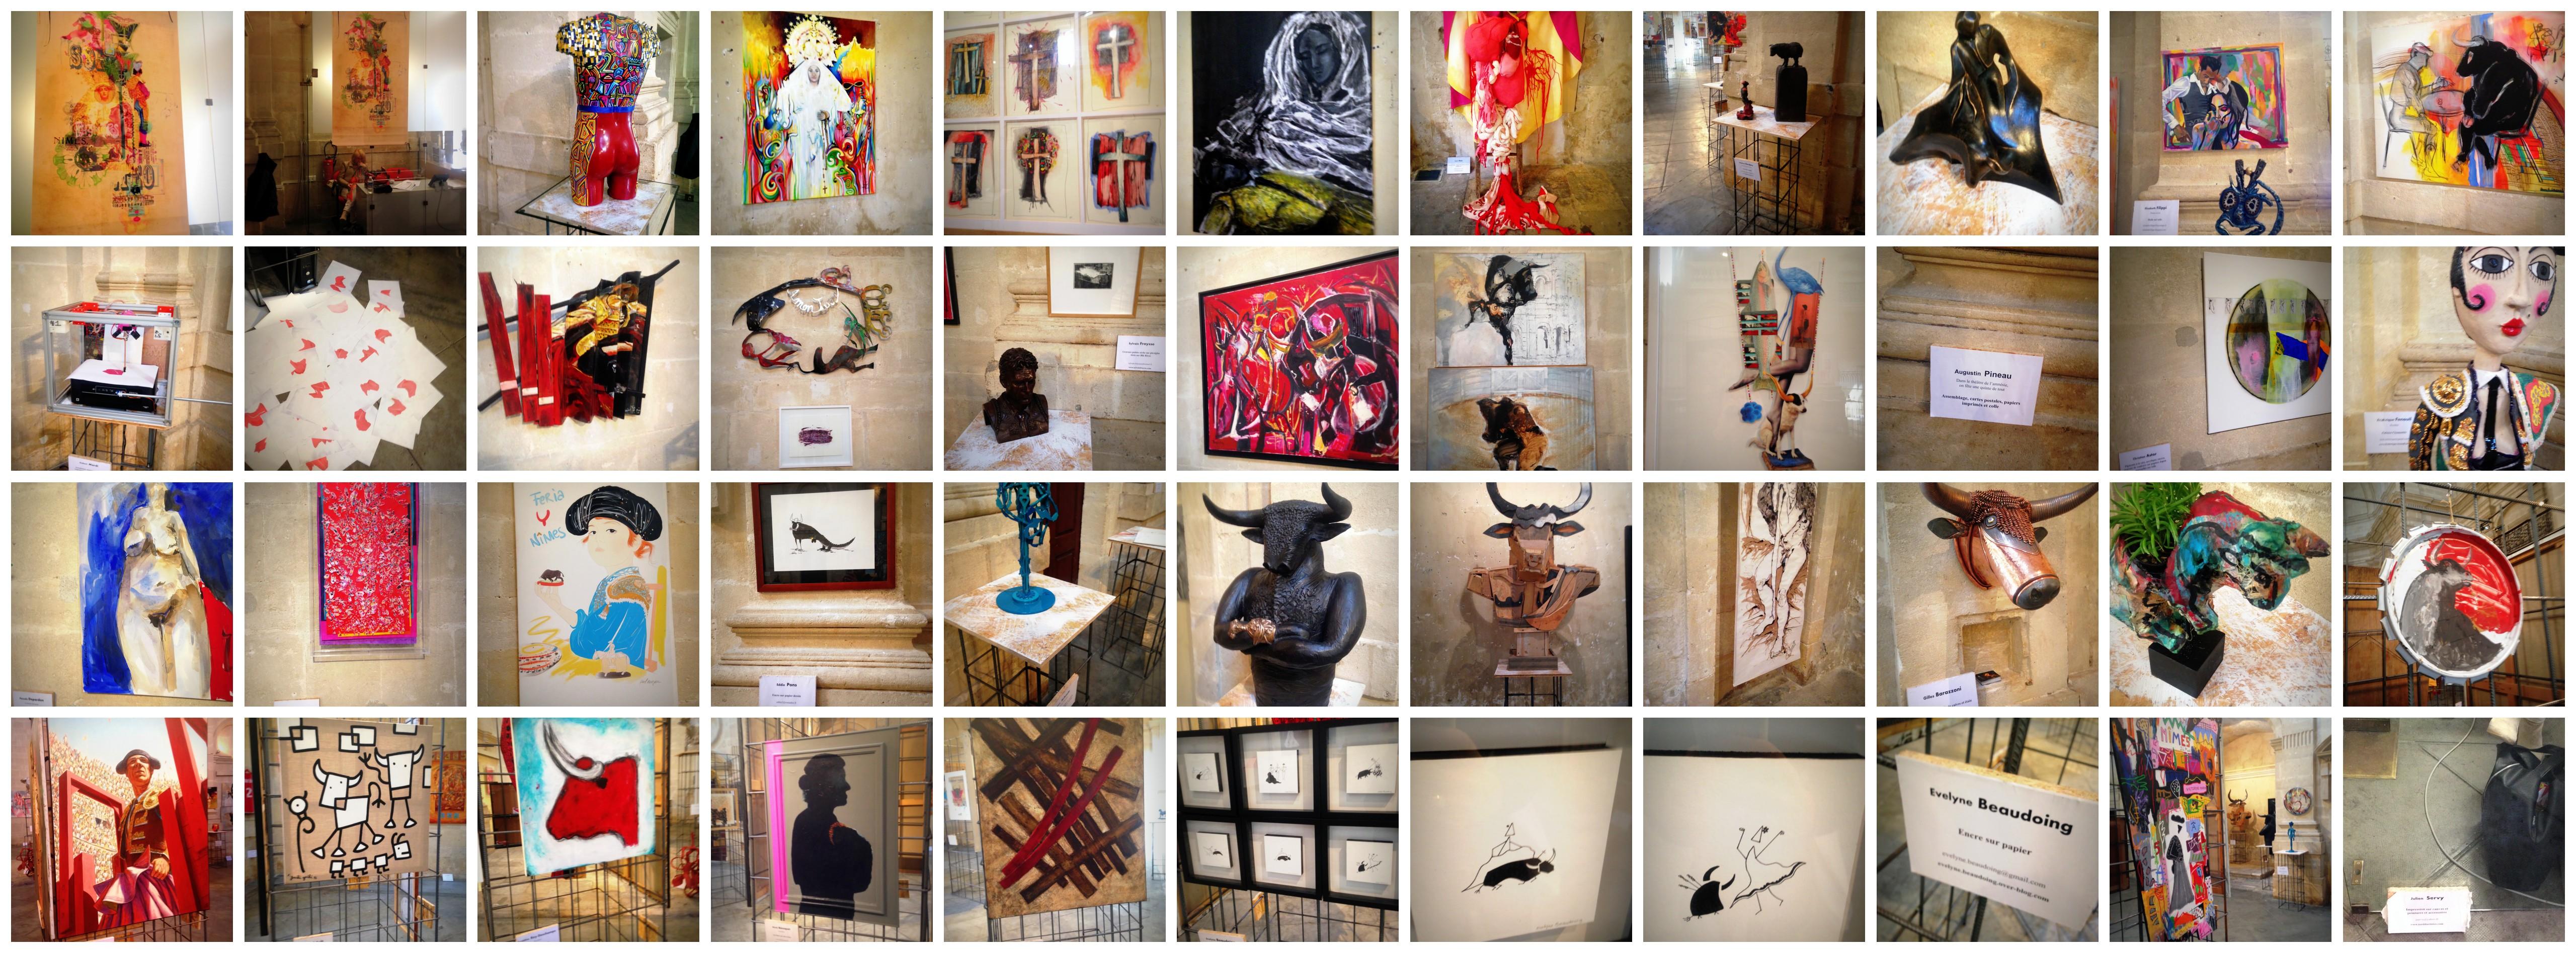 120 Artistes Nîmois